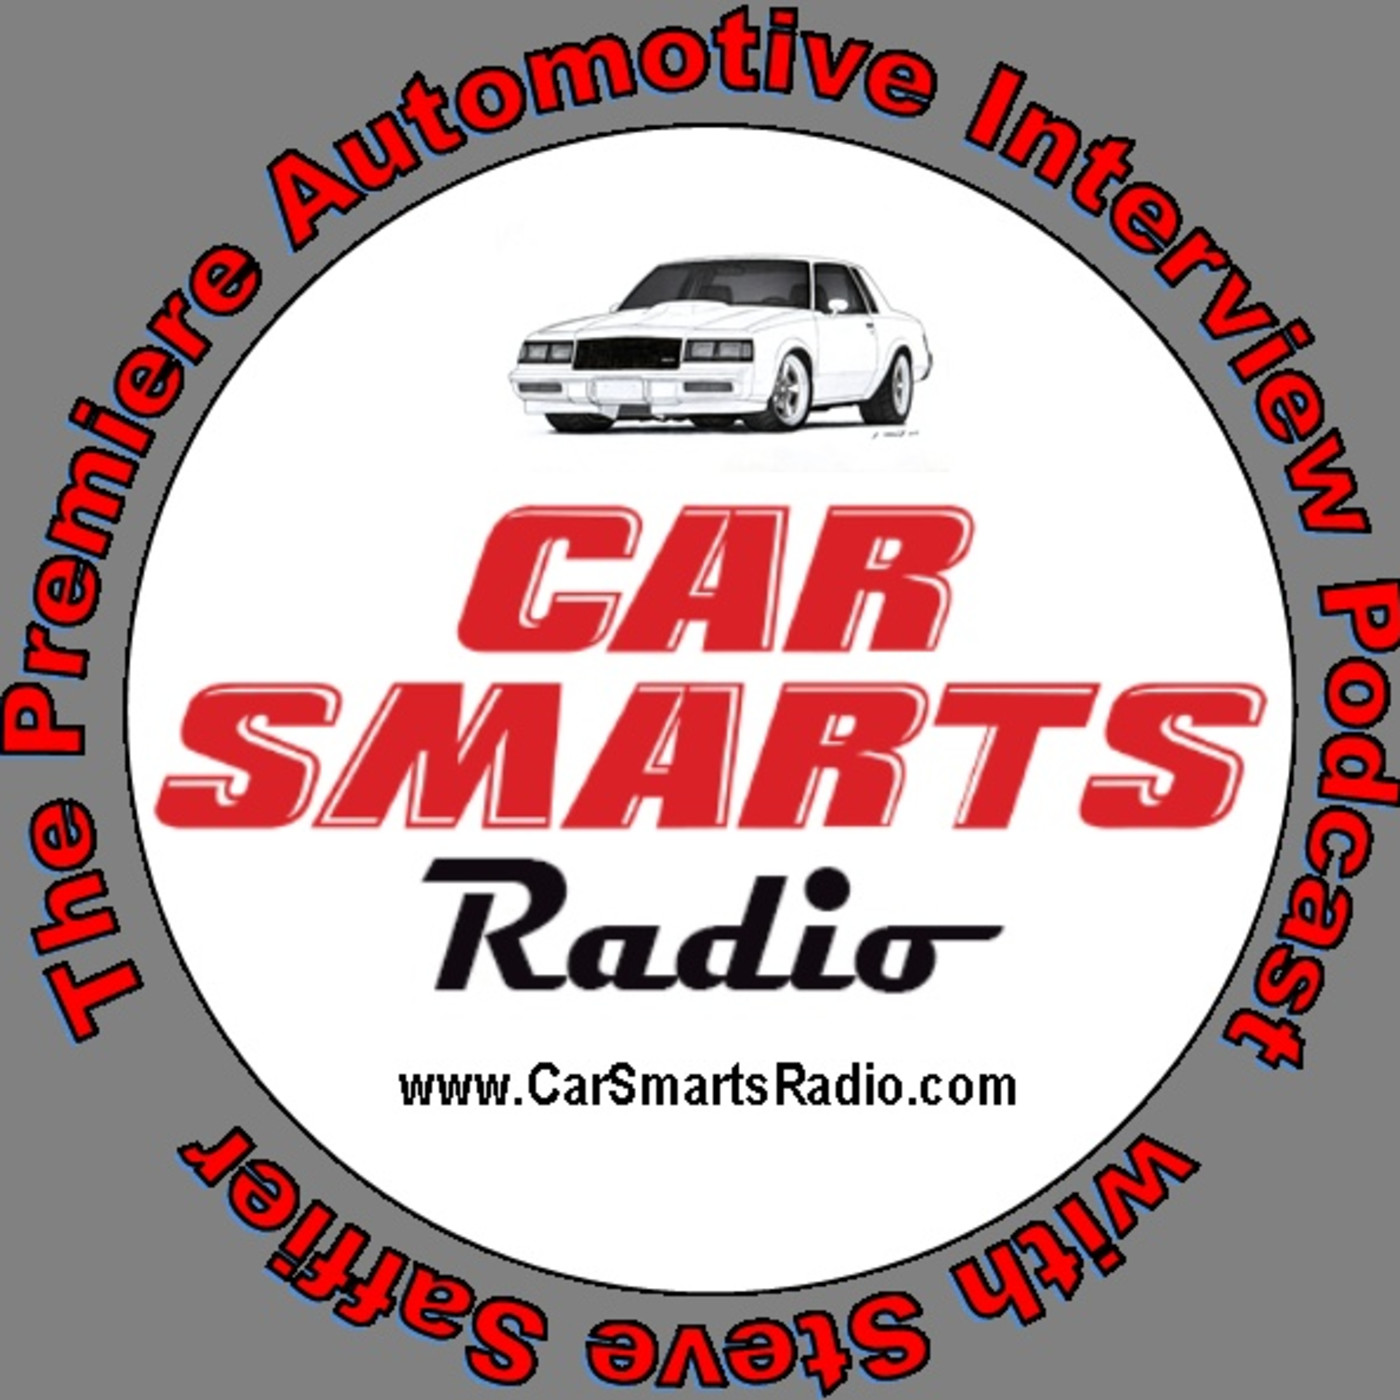 CarSmarts Radio - Iron Trap Garage